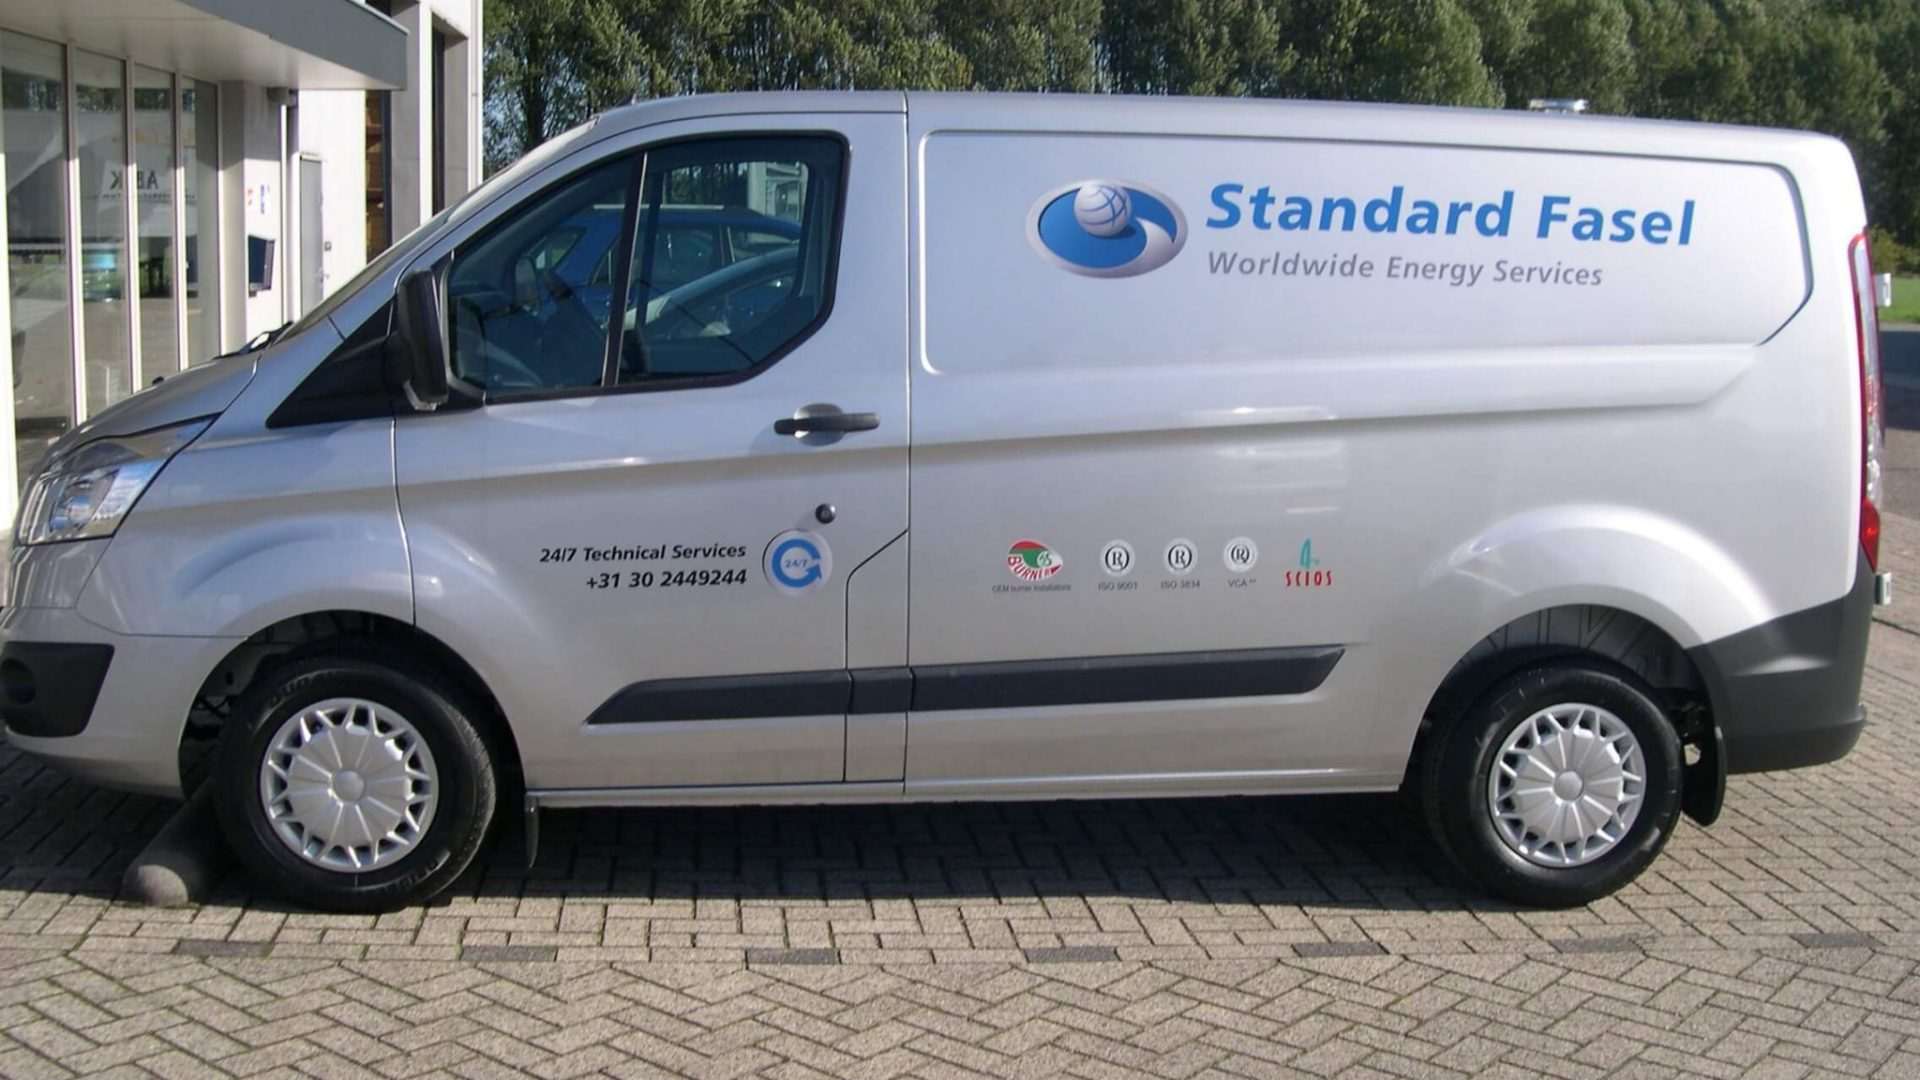 Ford-Custom-Standard Fasel-Okt-2013 (17)